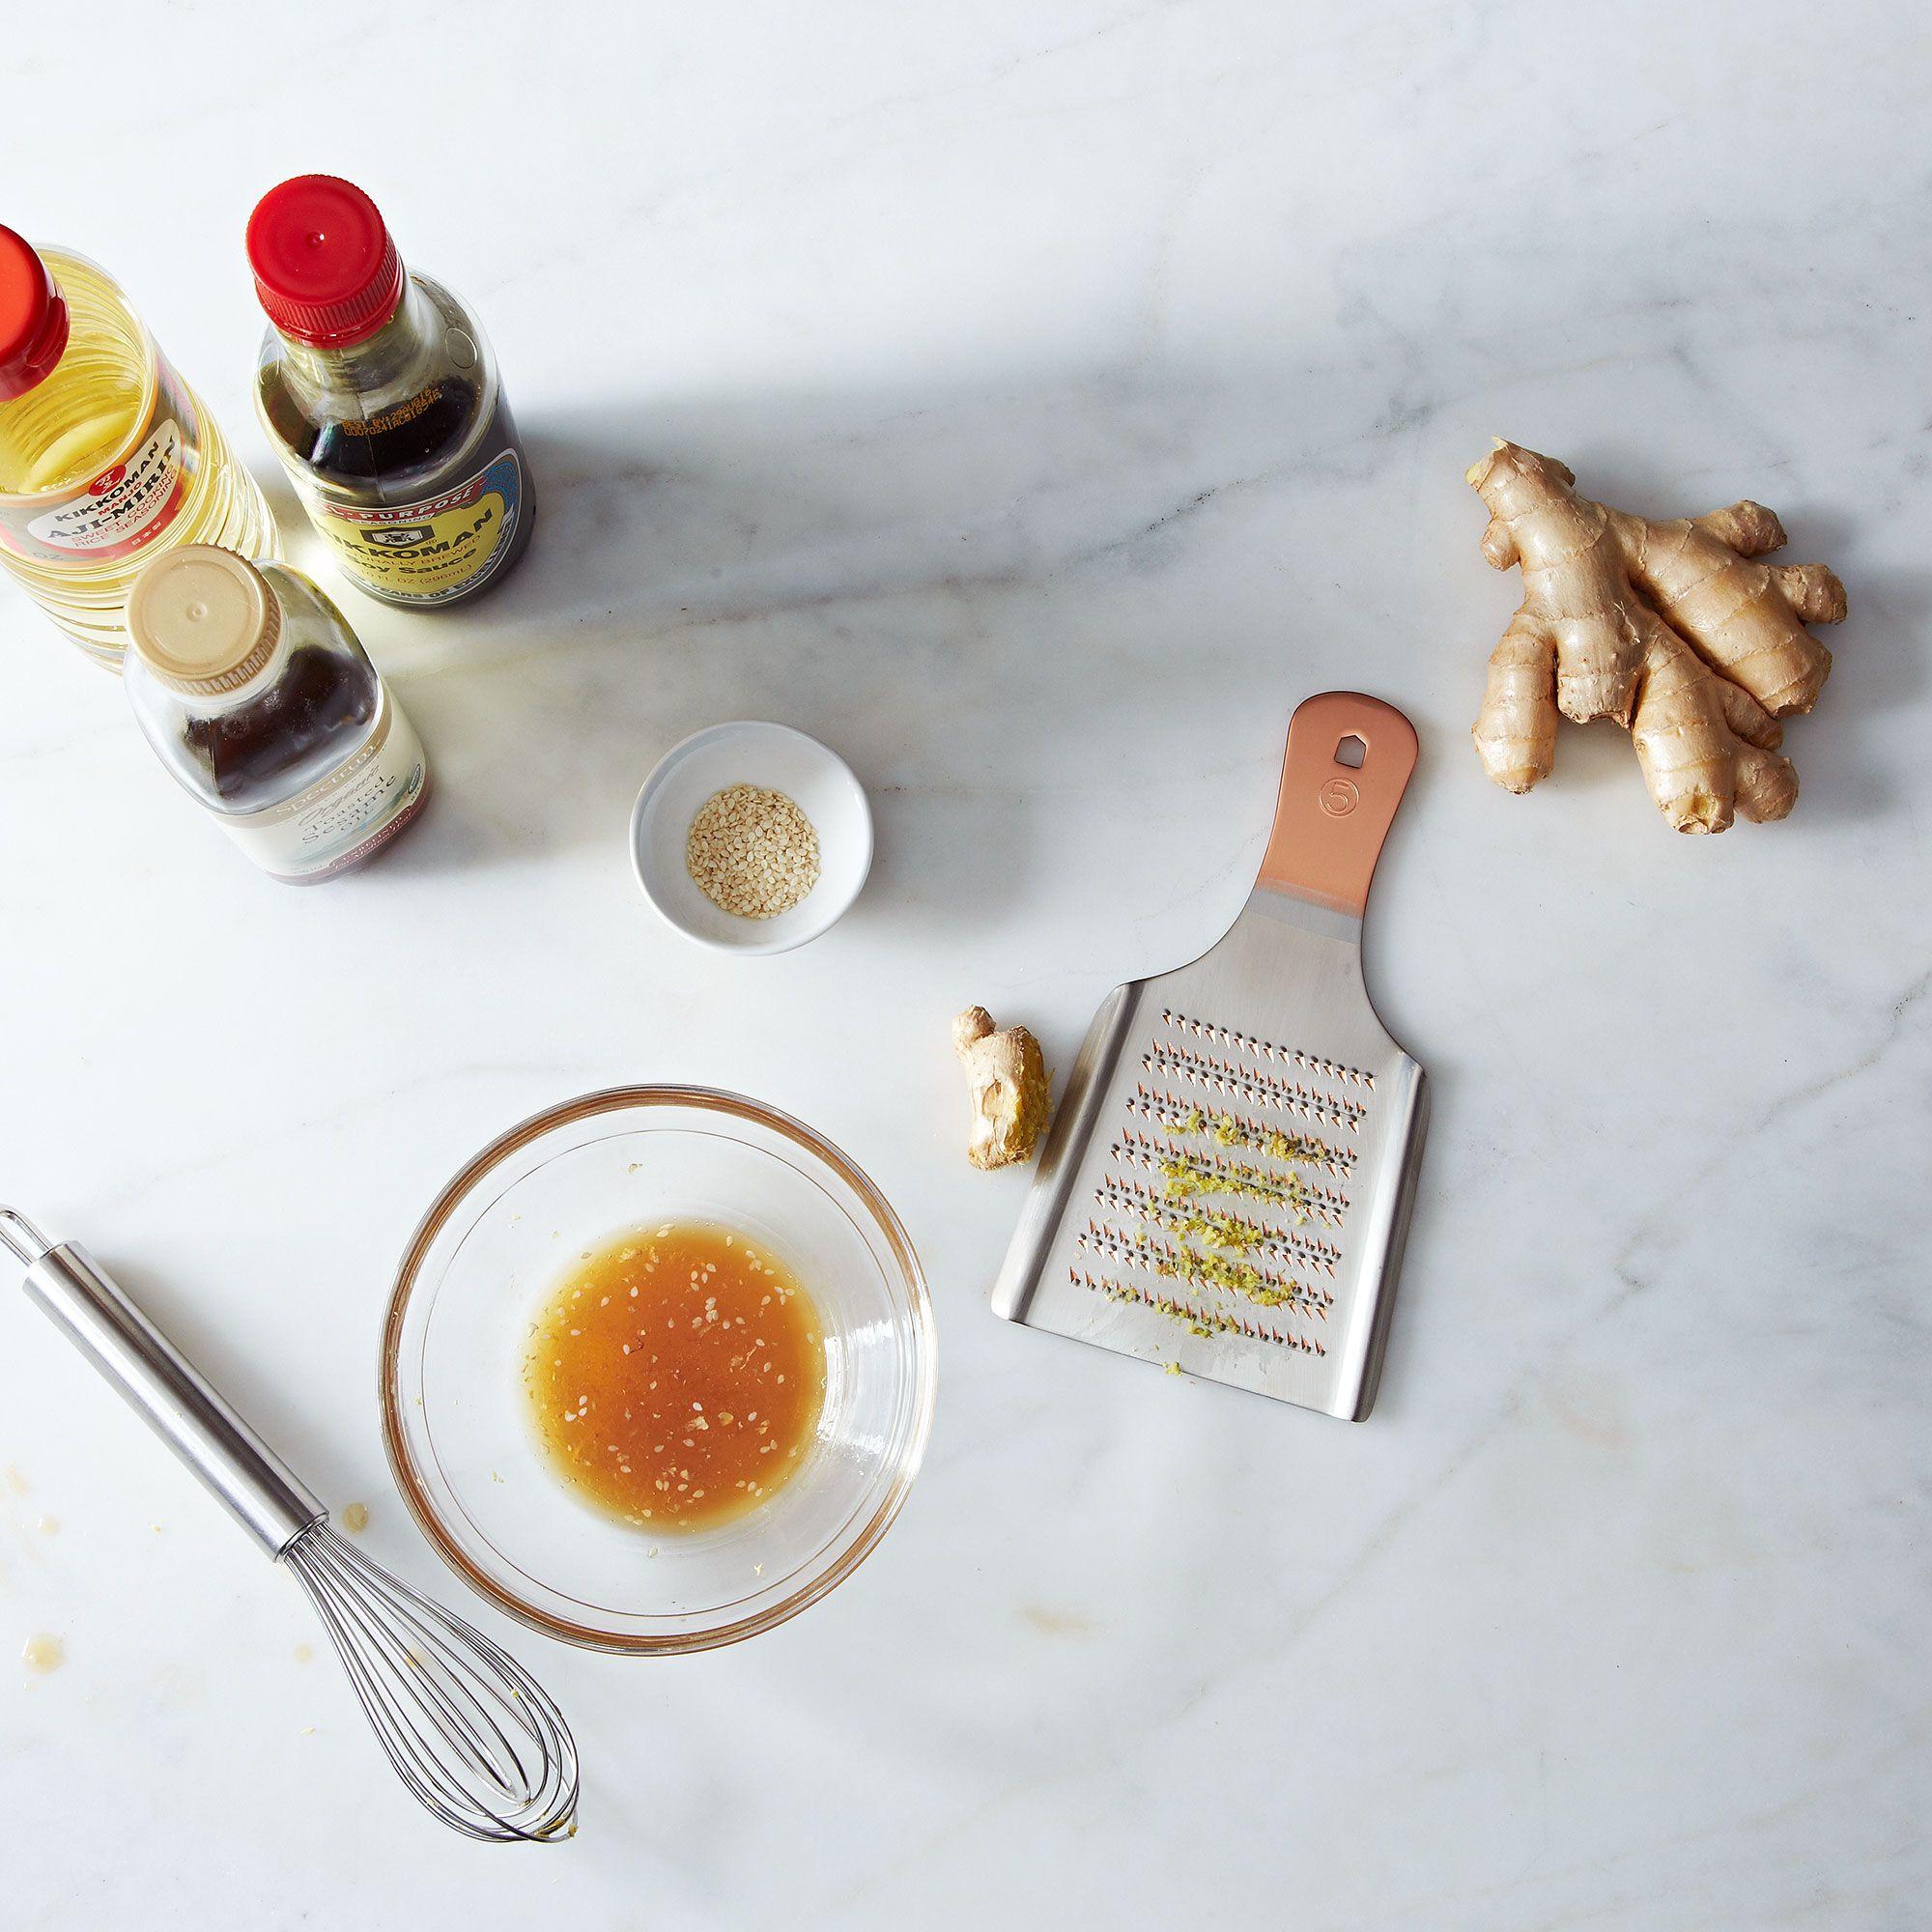 ceramic made asp peeler vegetable japan p potato in kitchen cera forever with grater